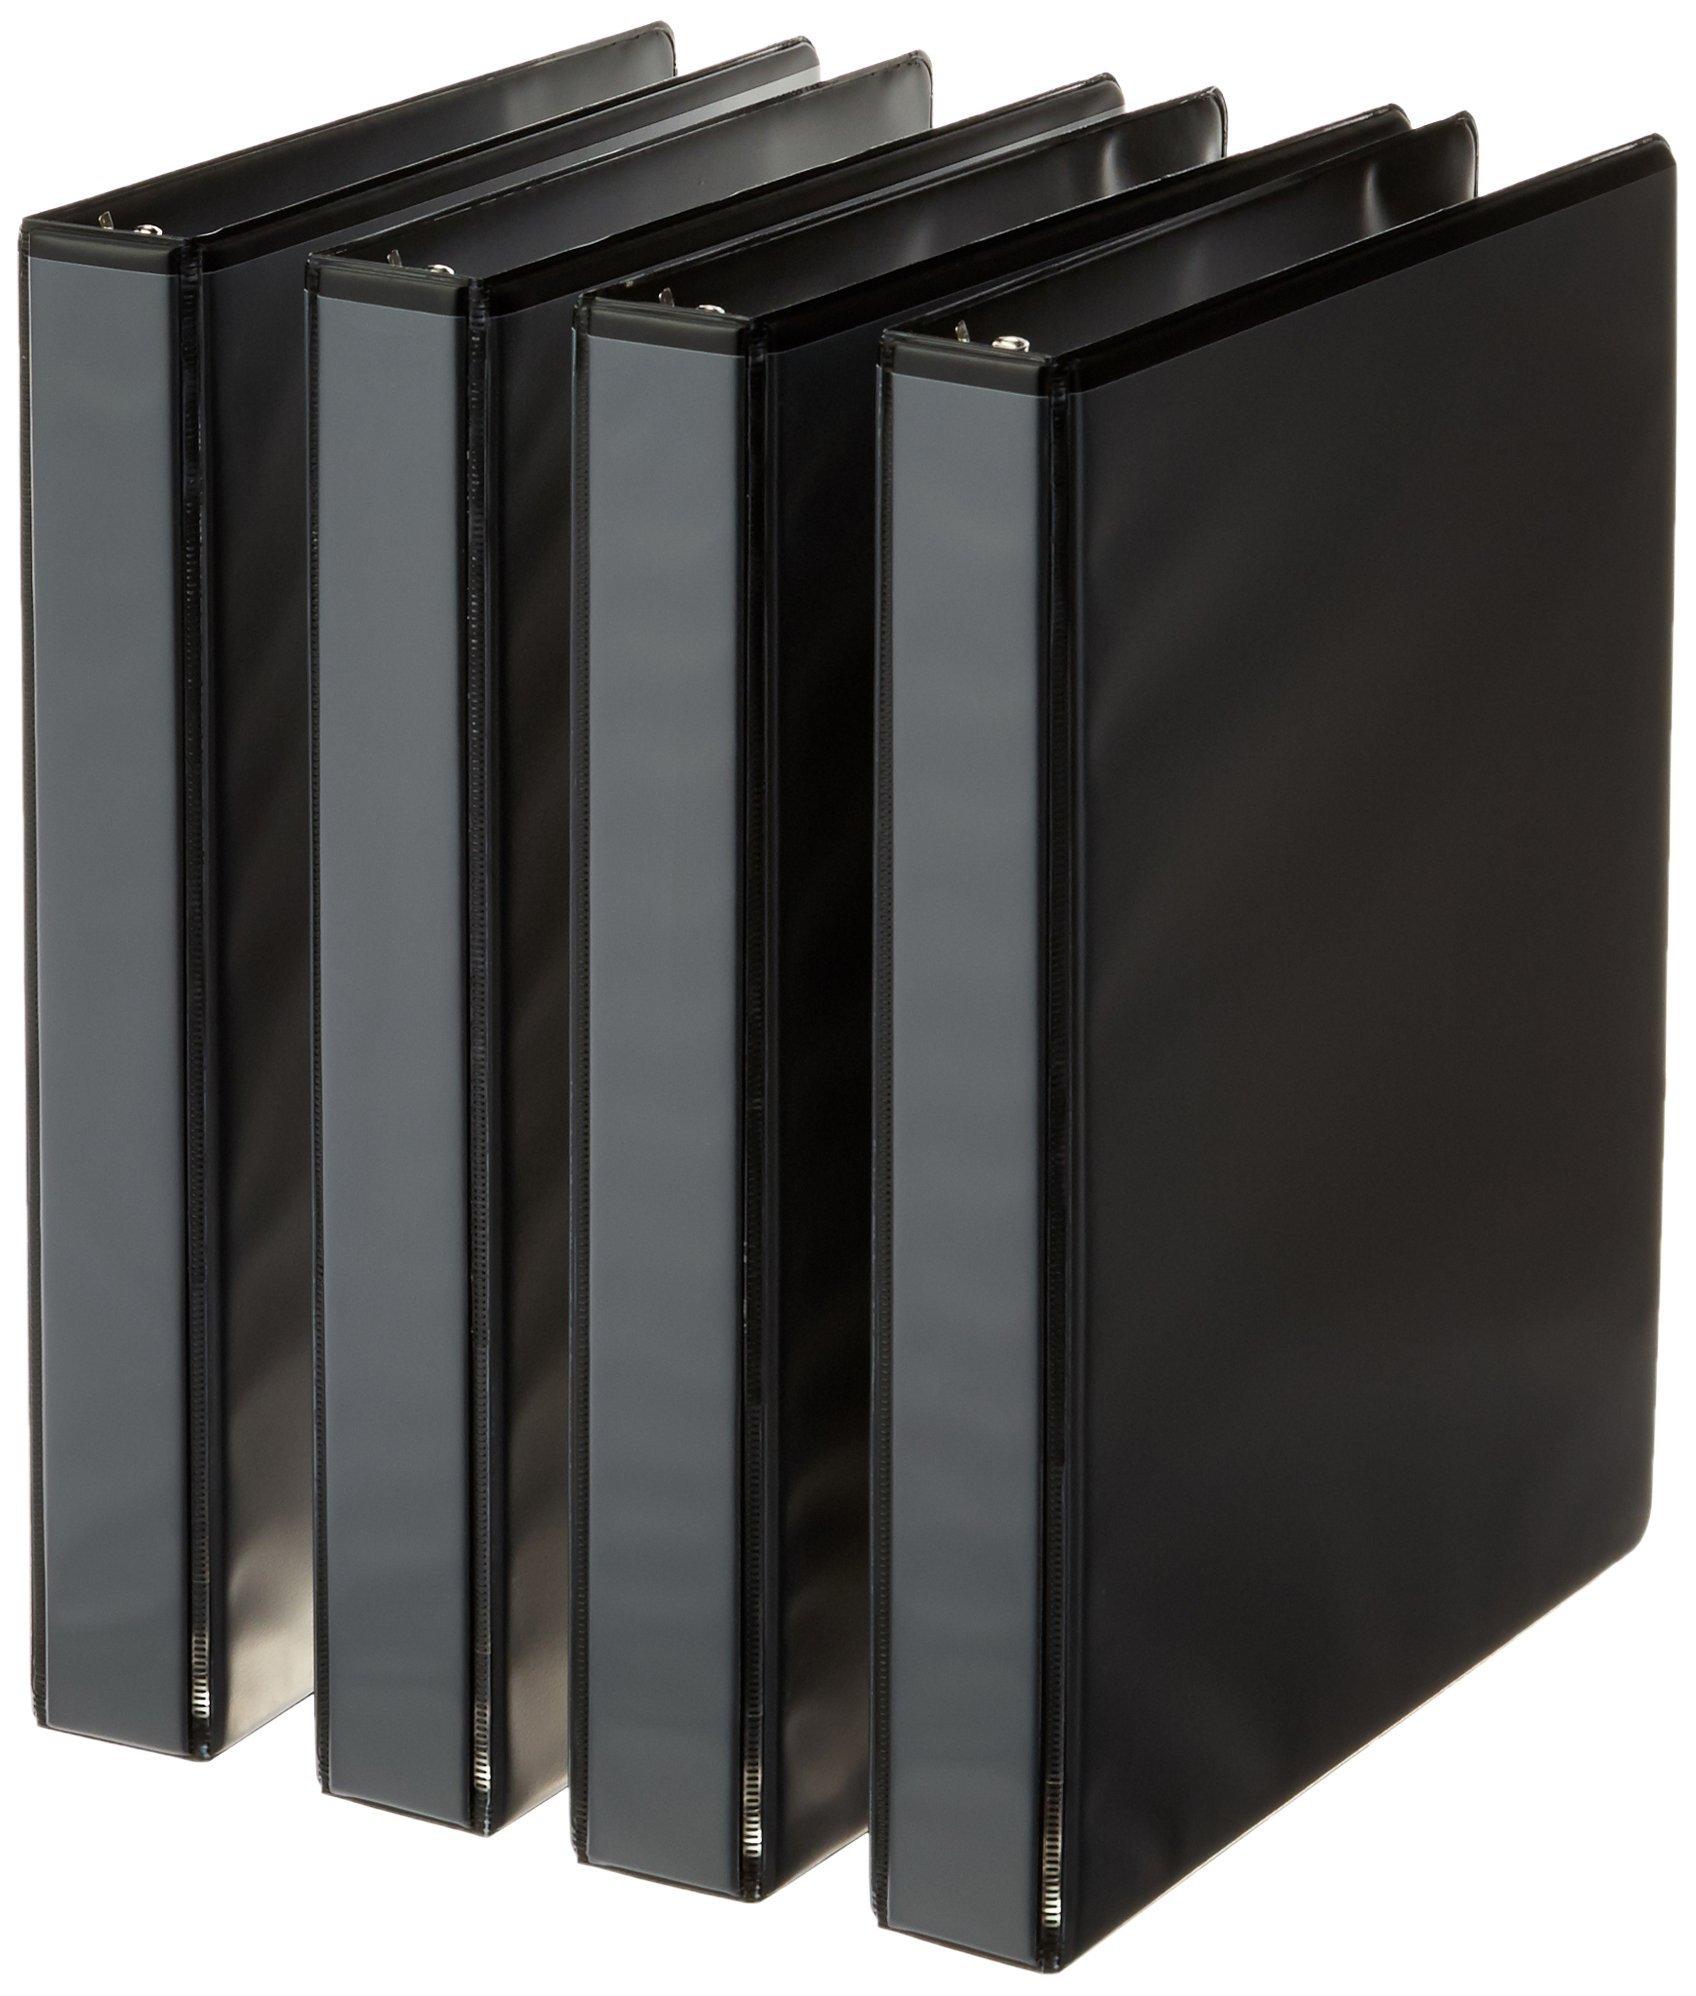 AmazonBasics 3-Ring Binder, 1 Inch - Black, 4-Pack